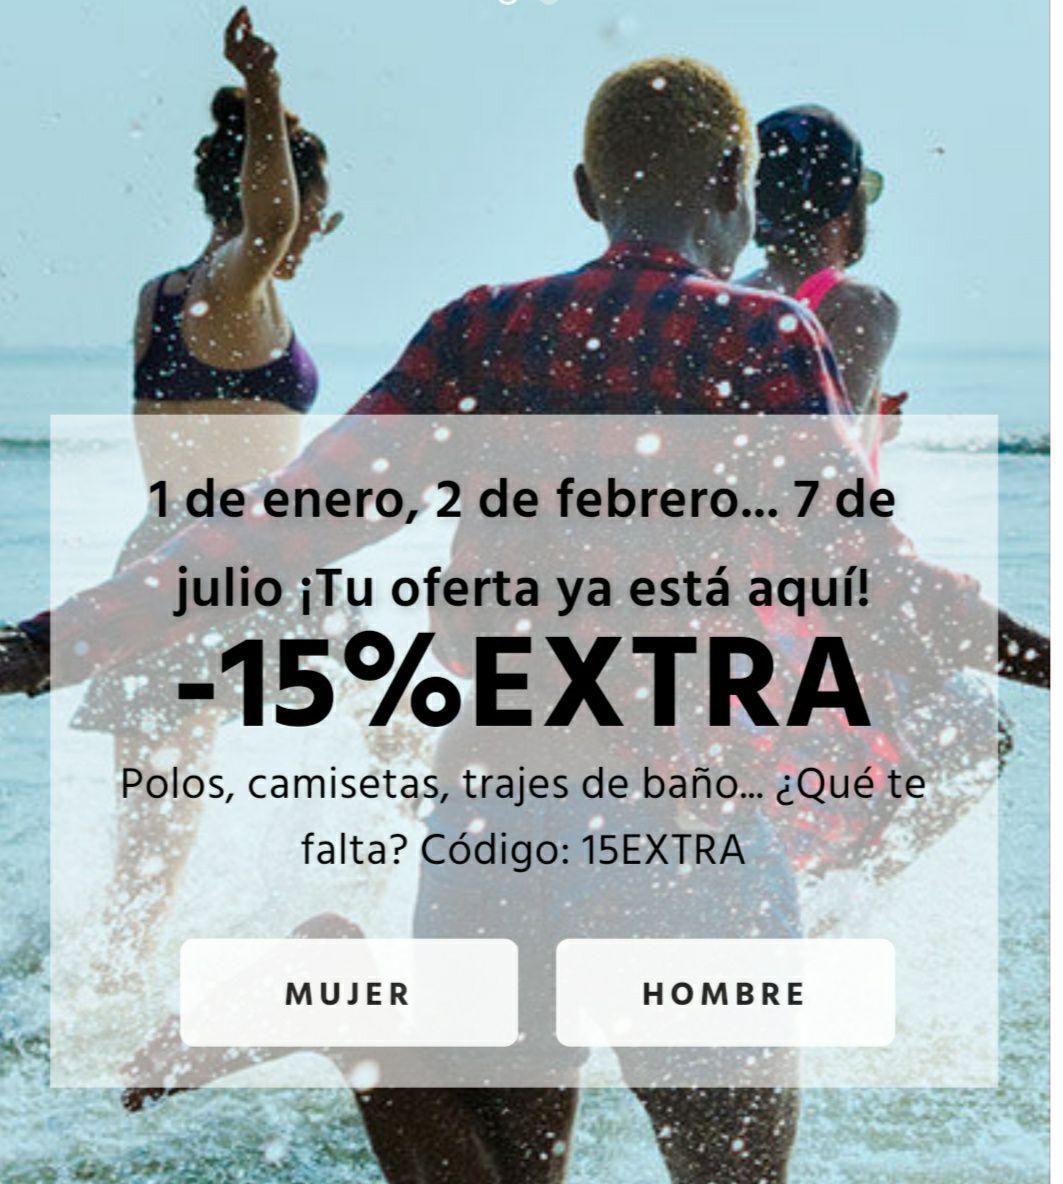 FIFTY 15% EXTRA EN CATEGORIA PLAYA